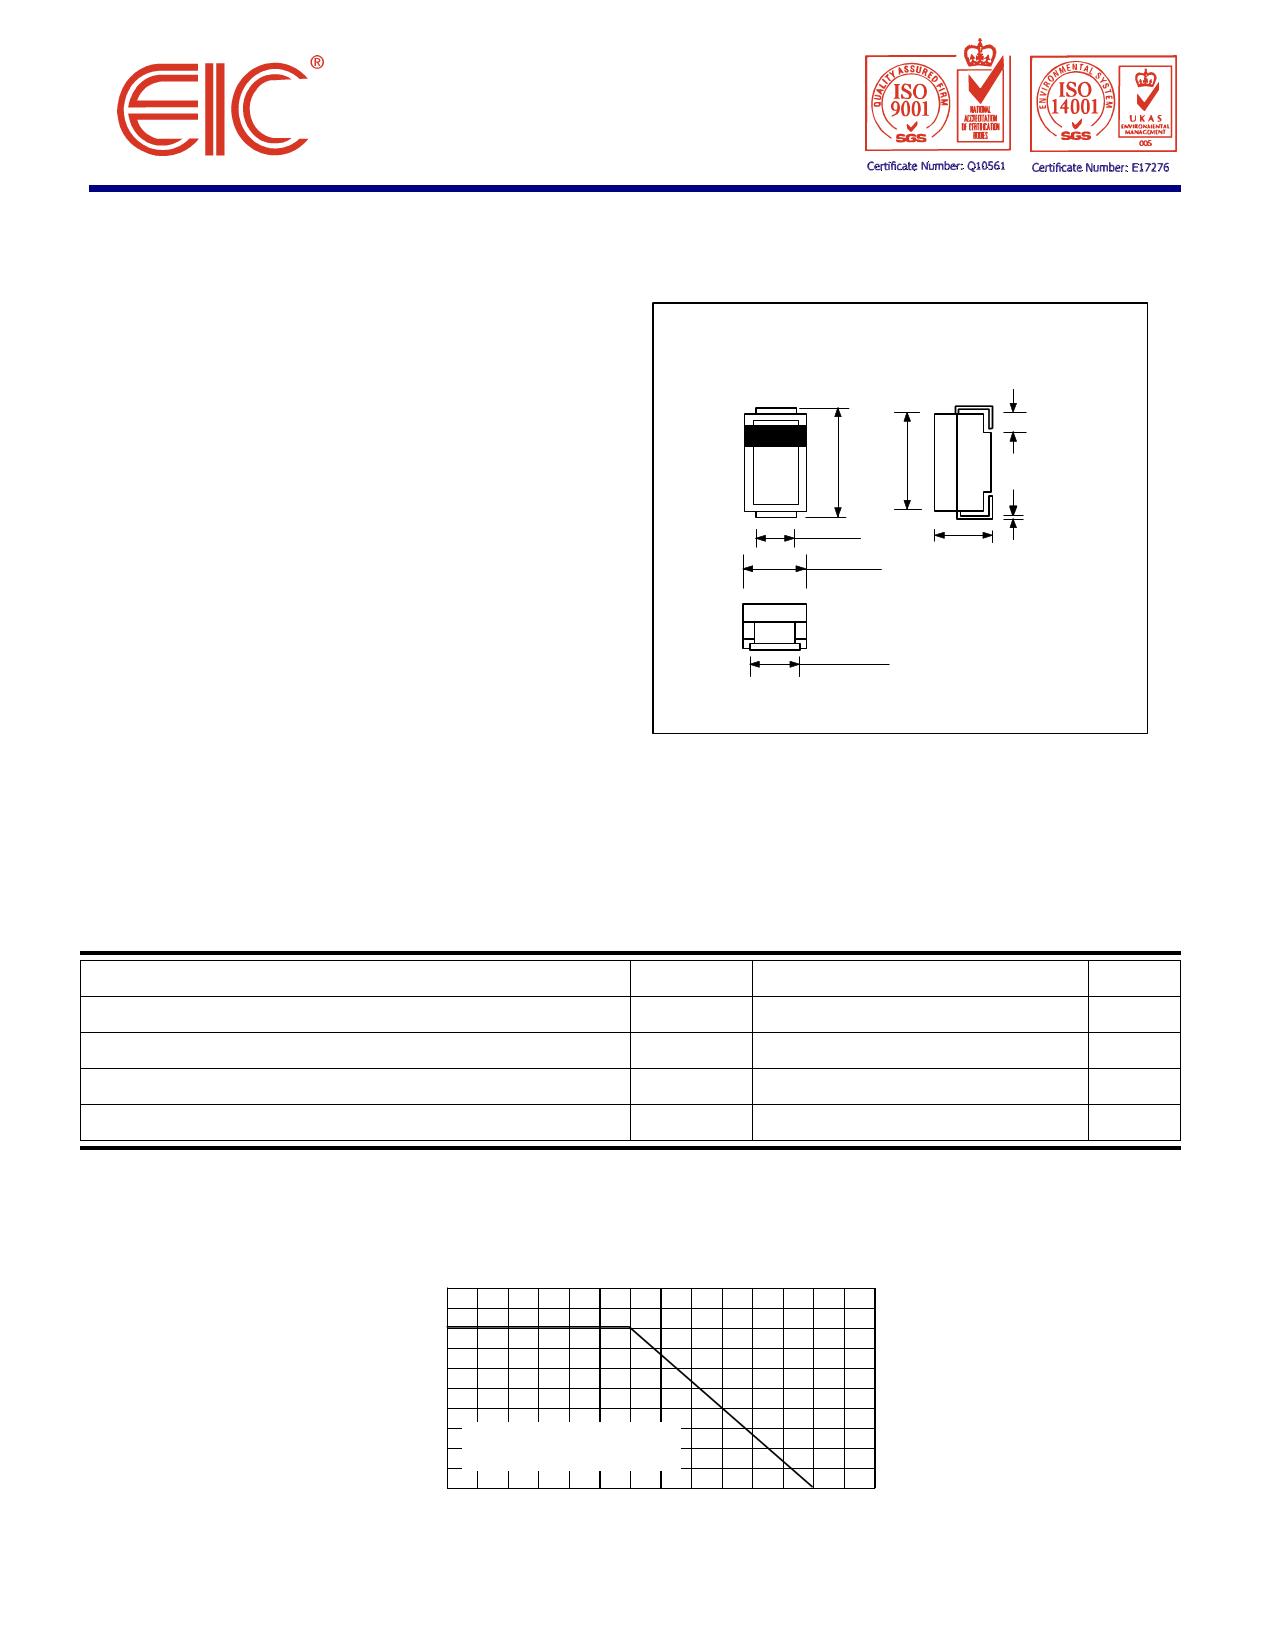 SZ40B4 datasheet, circuit